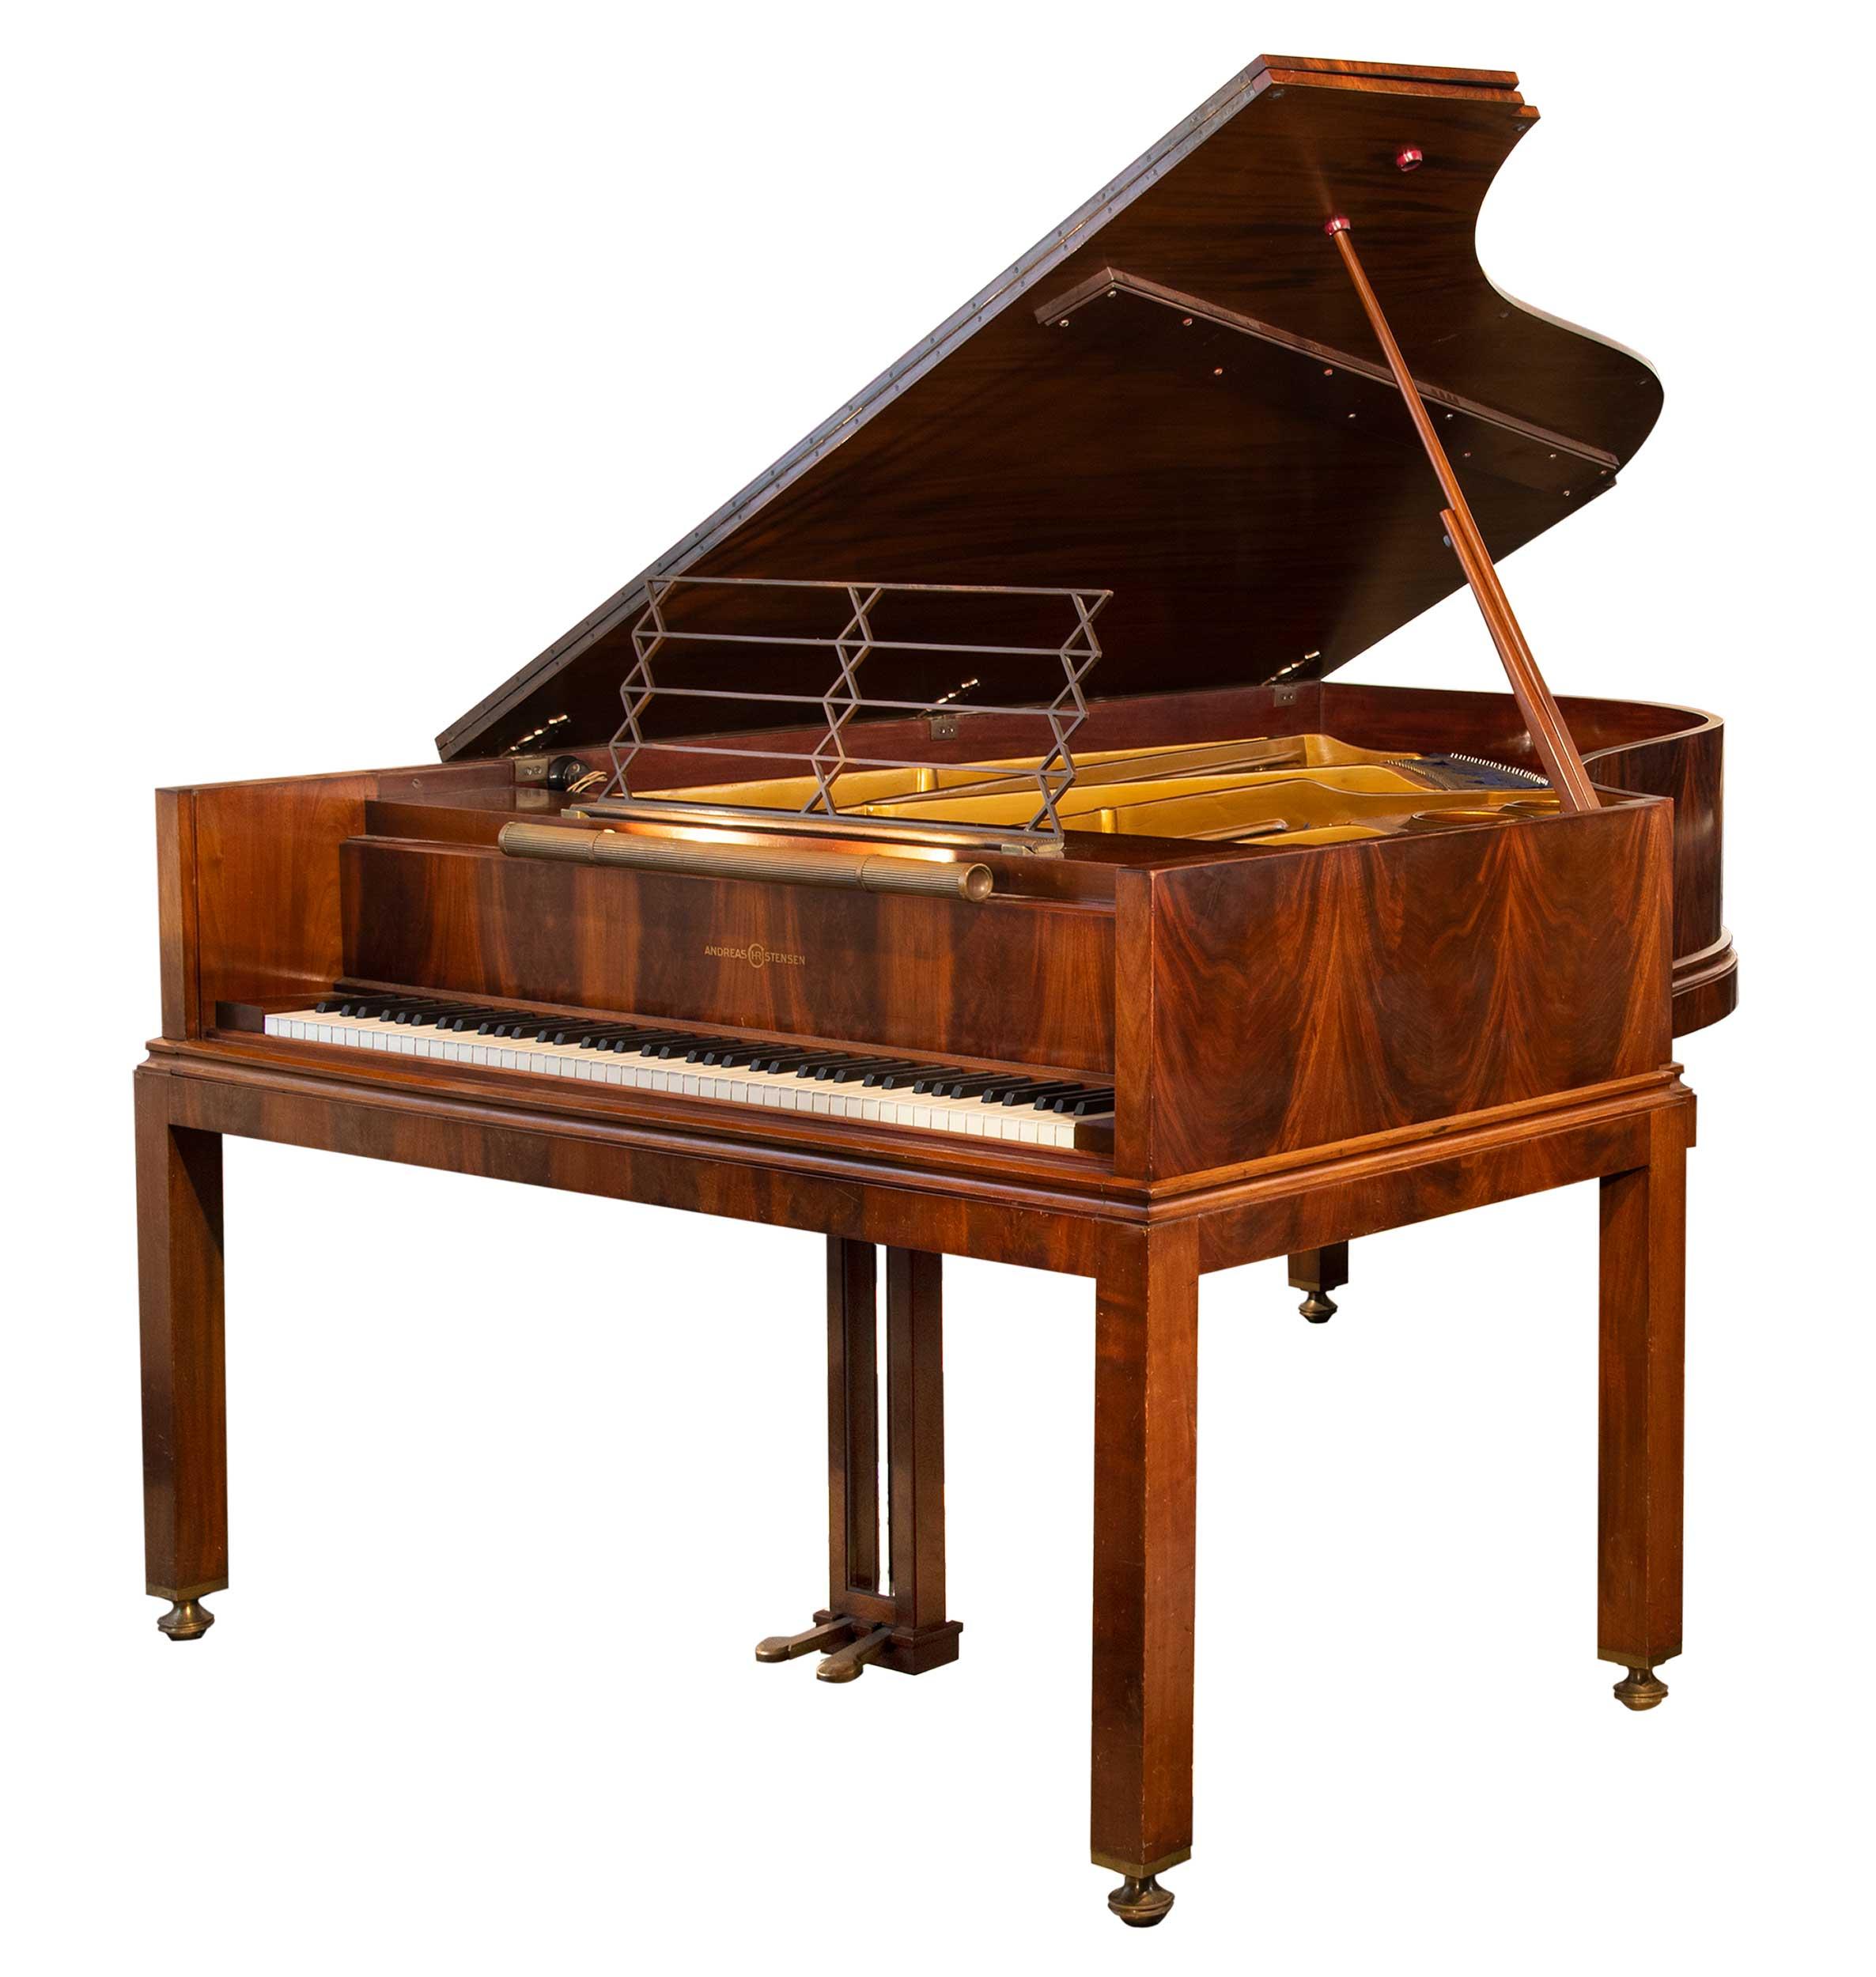 Art Deco piano, Andreas Christensen, Danish Modern, Modernist Style